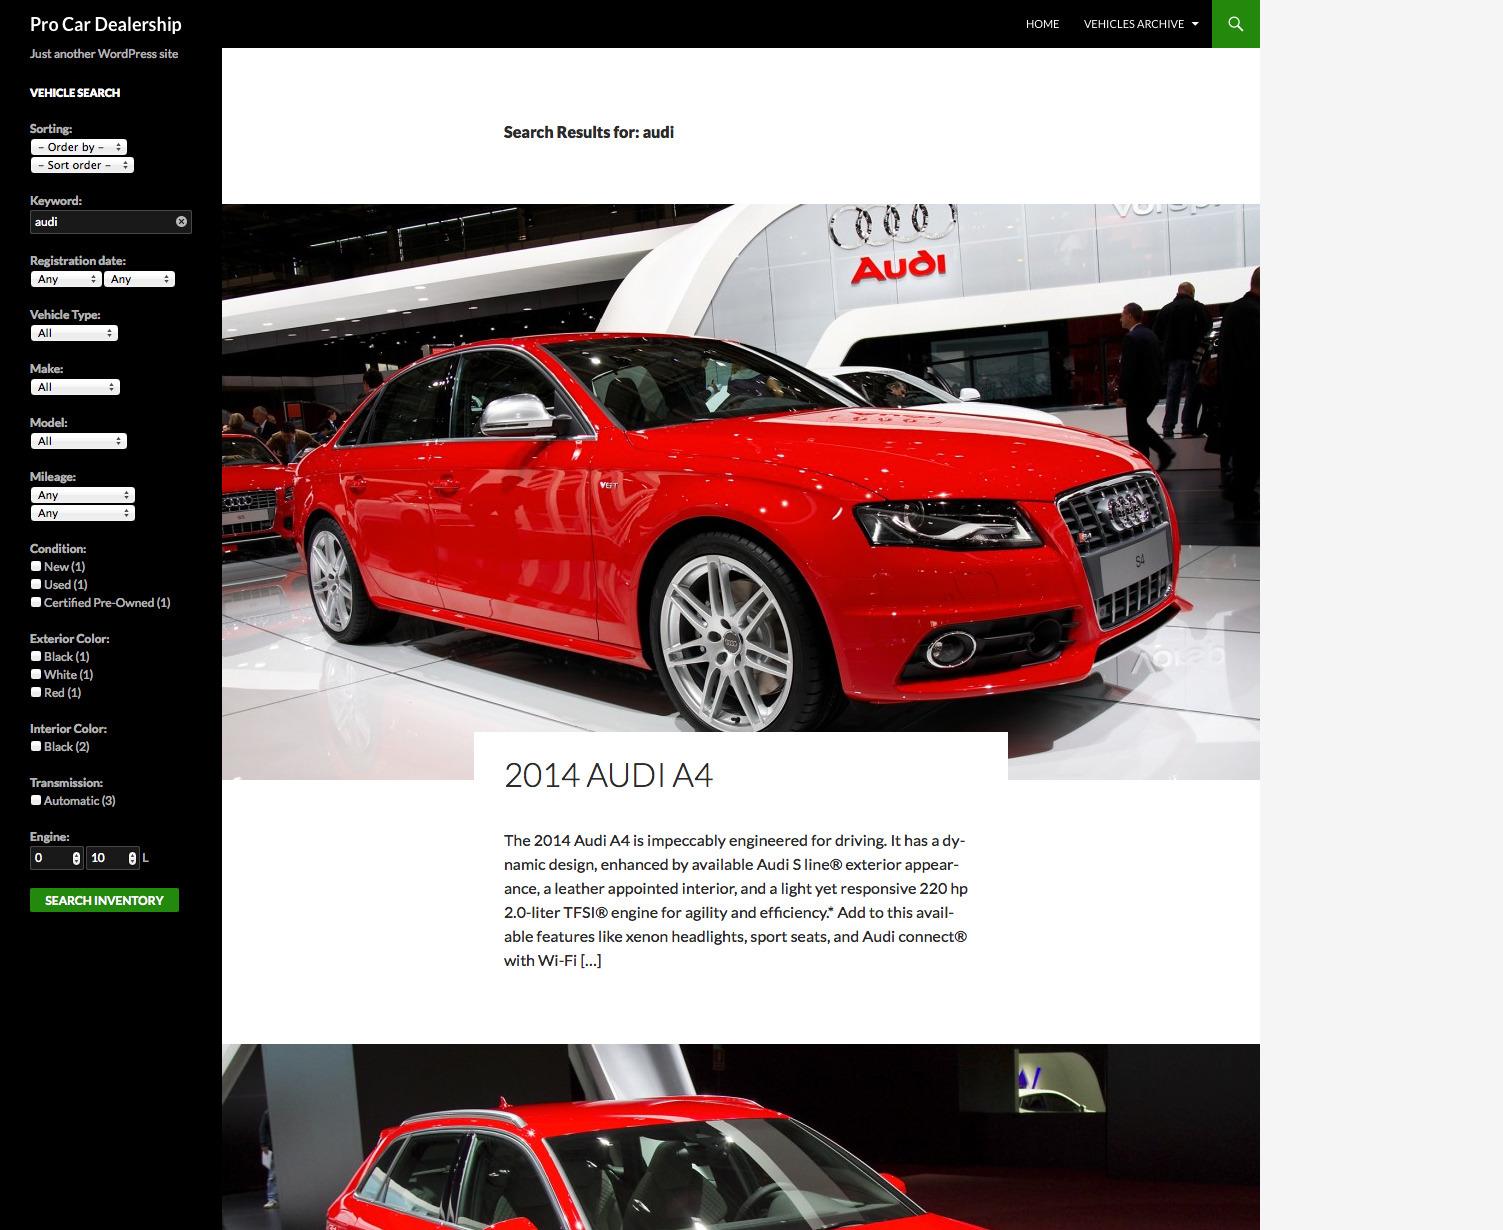 Pro Car Dealership - WordPress Plugin by ProgressionStudios | CodeCanyon